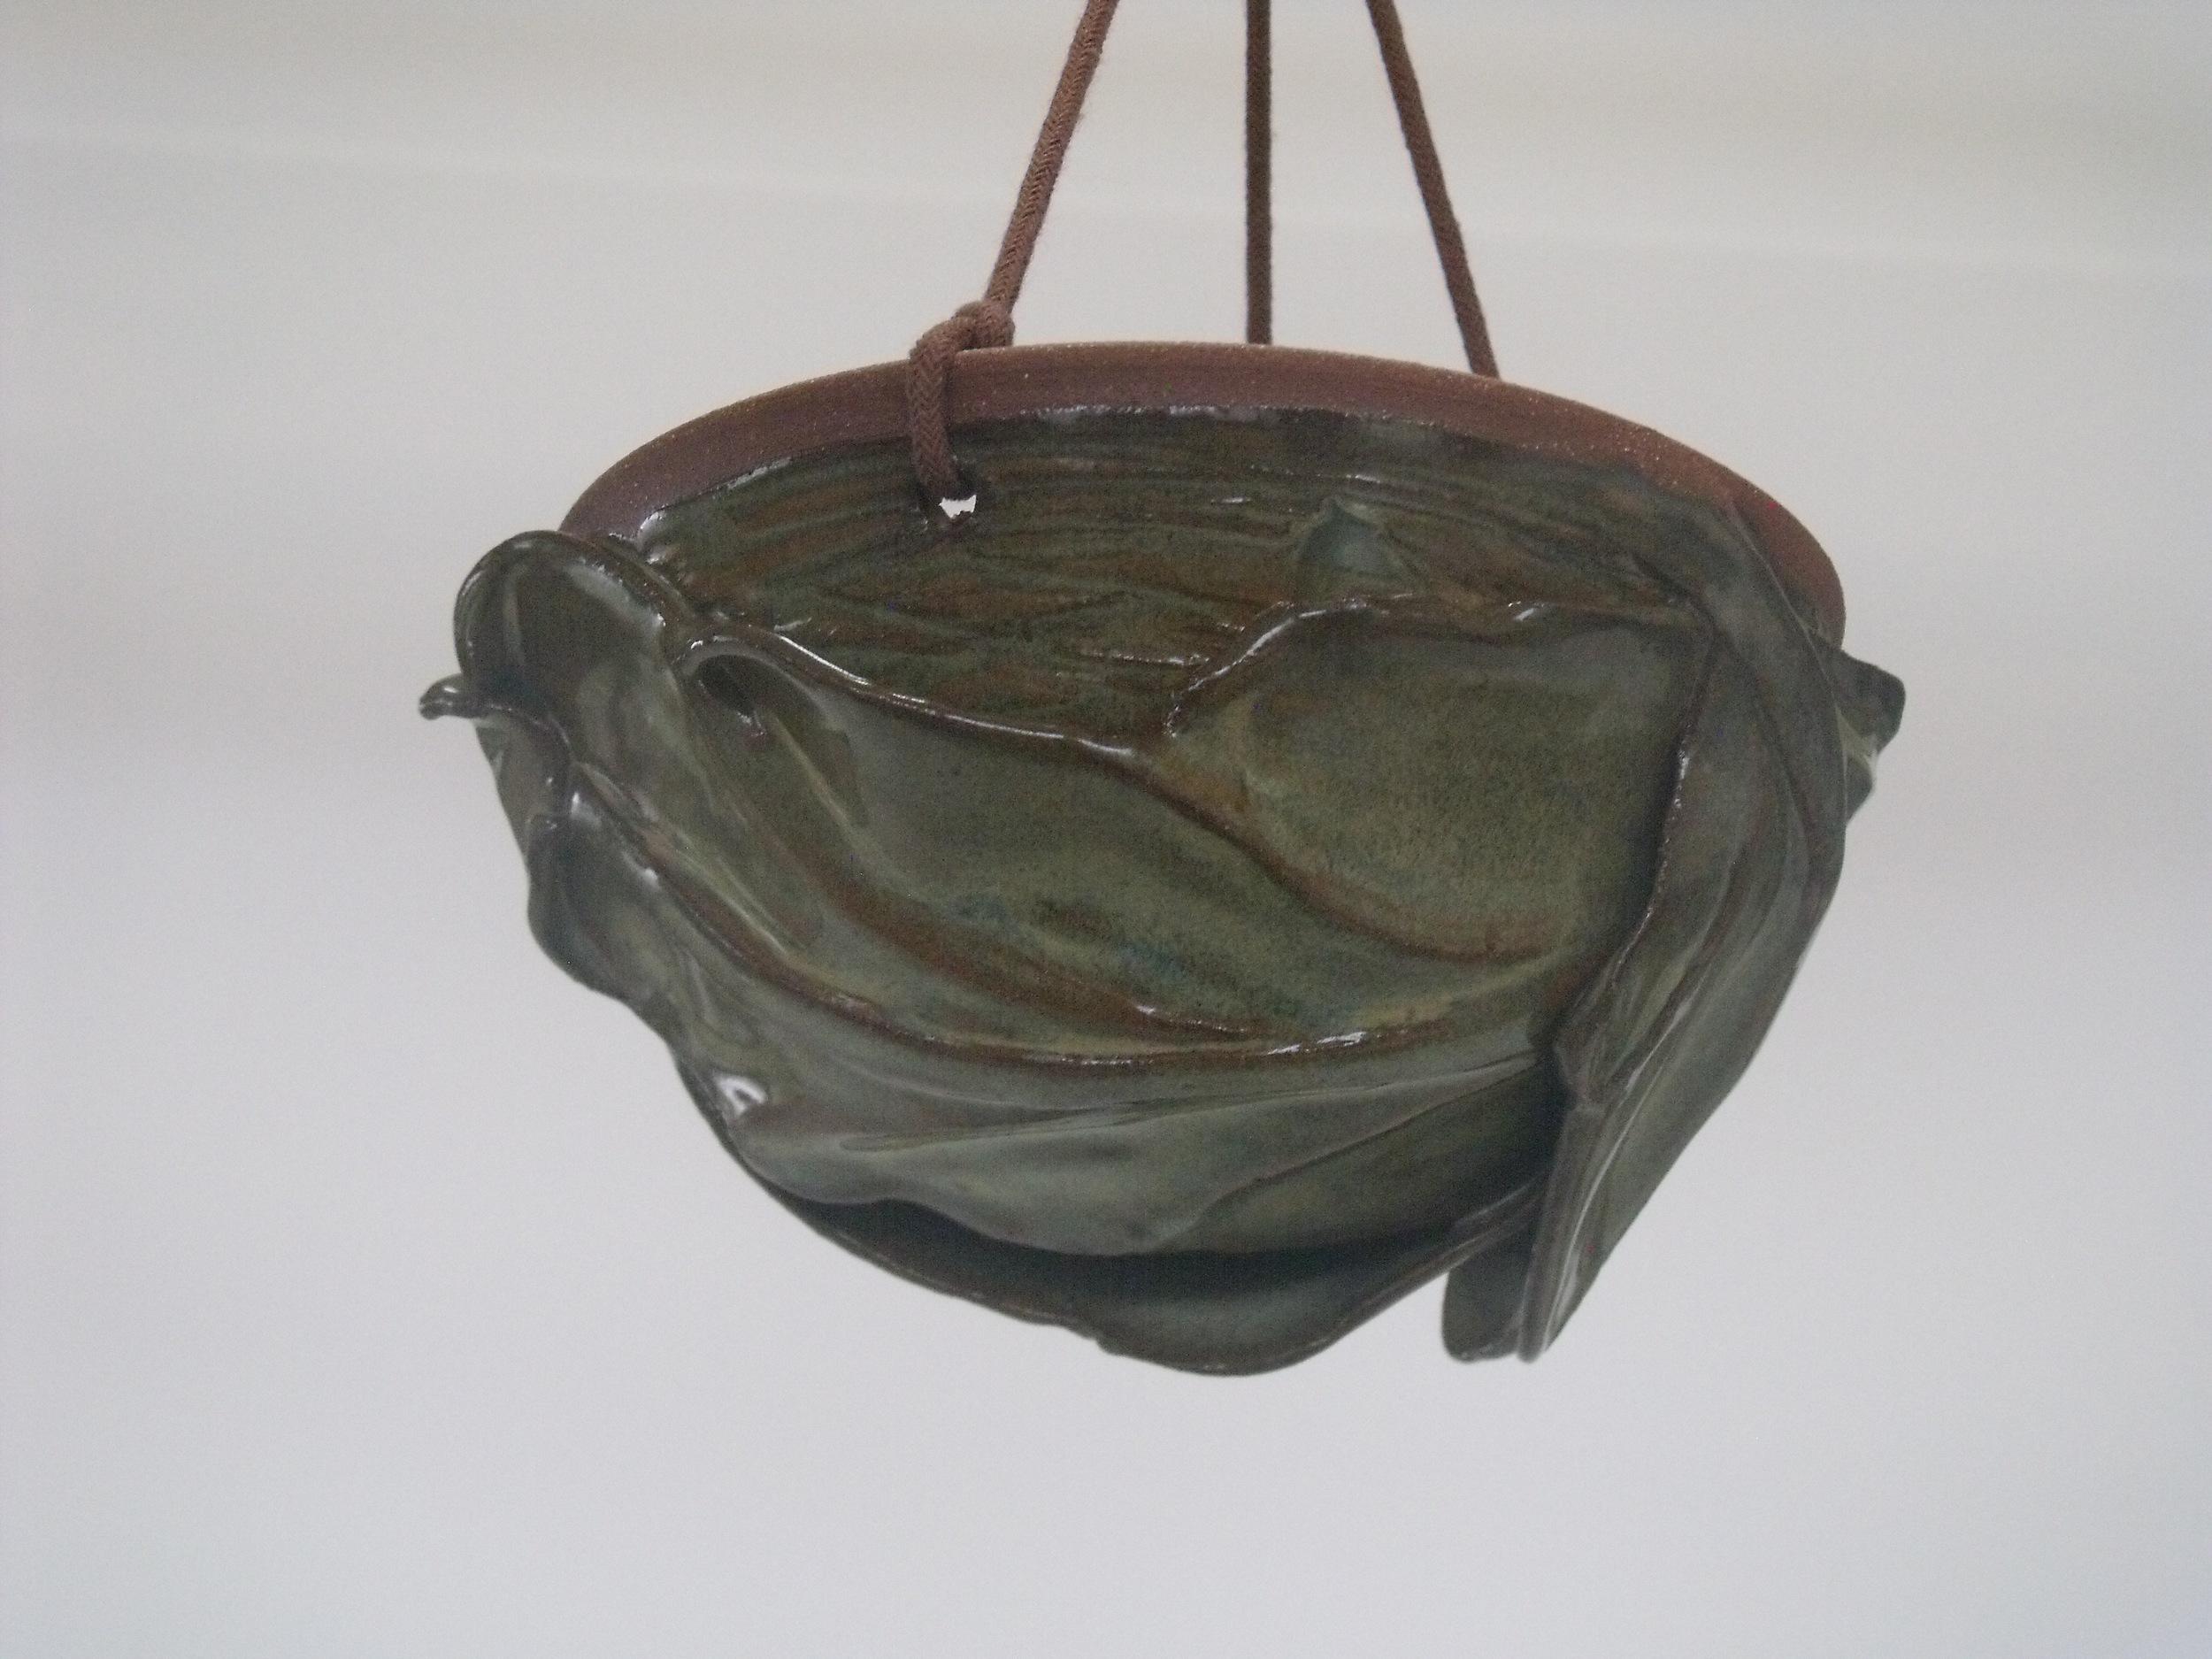 KMBK8 Hanging Nest Pot